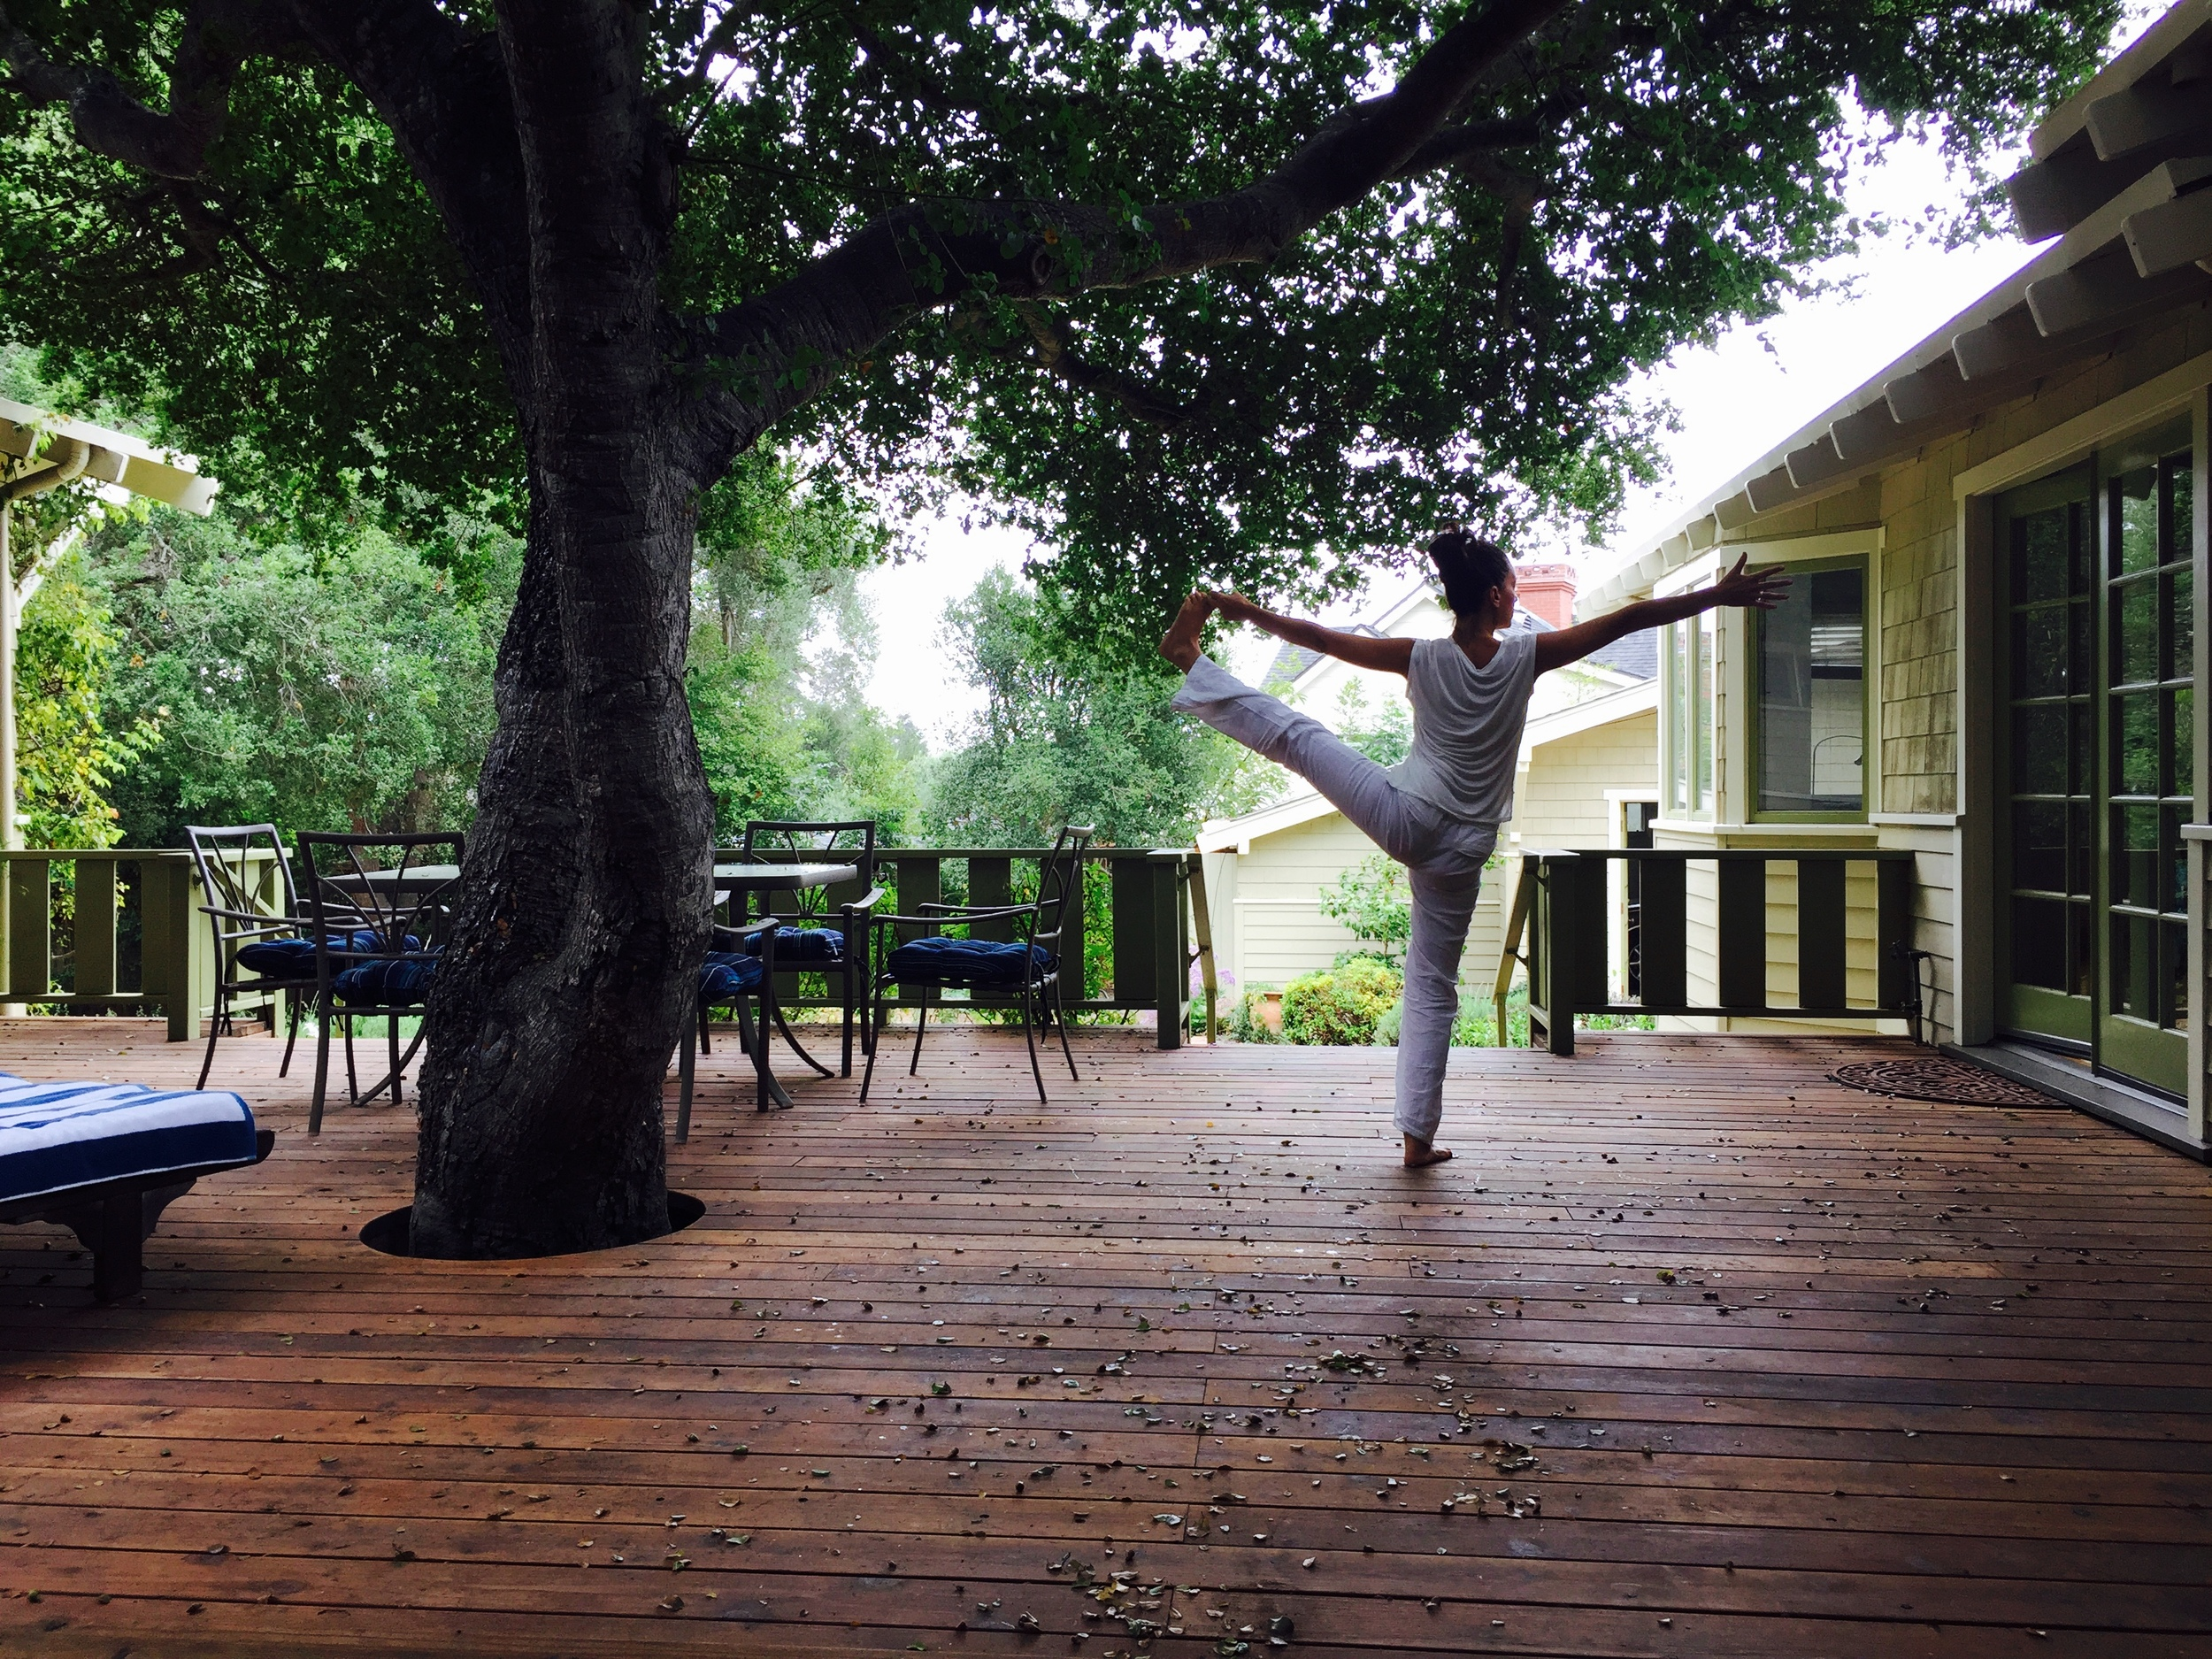 Pratique de yoga à Montecito, Santa Barbara CA, USA. Maison de ma maman de coeur Mia, qui m'invita à mon premier cours de Hatha Yoga.